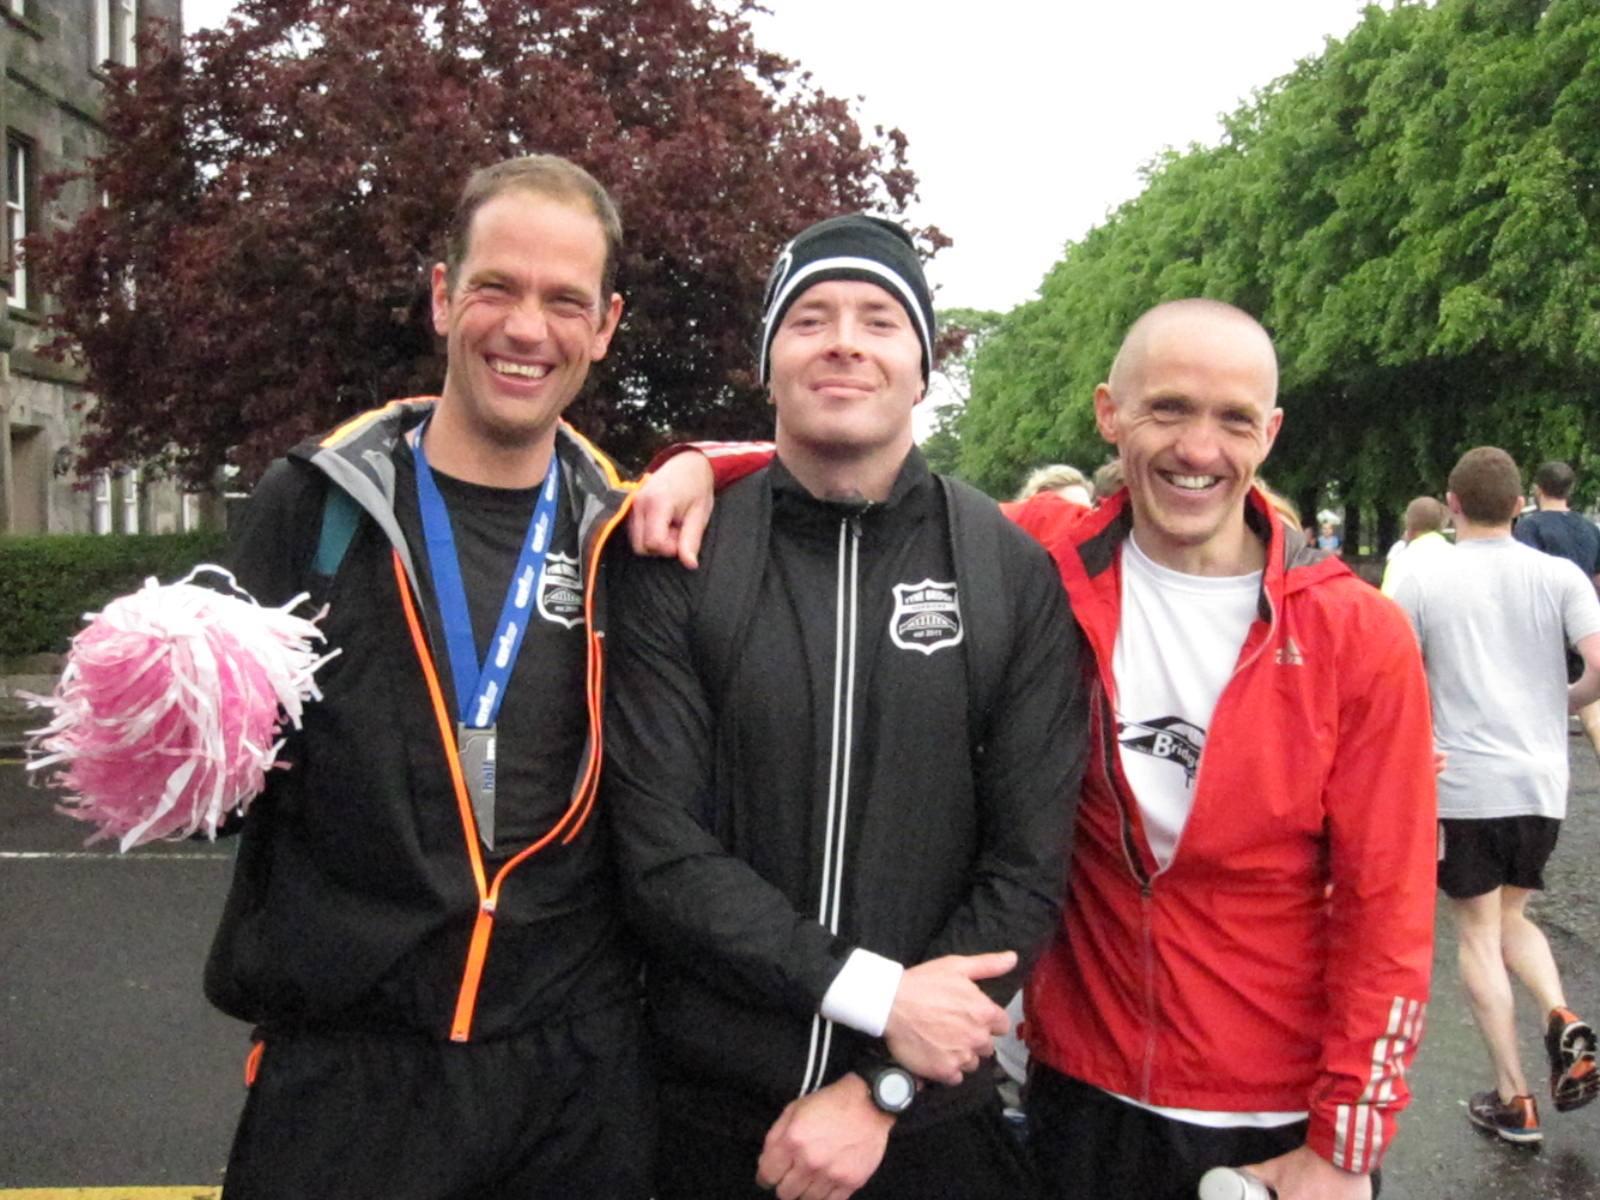 post-race (l-r) Cees, Jon & DD